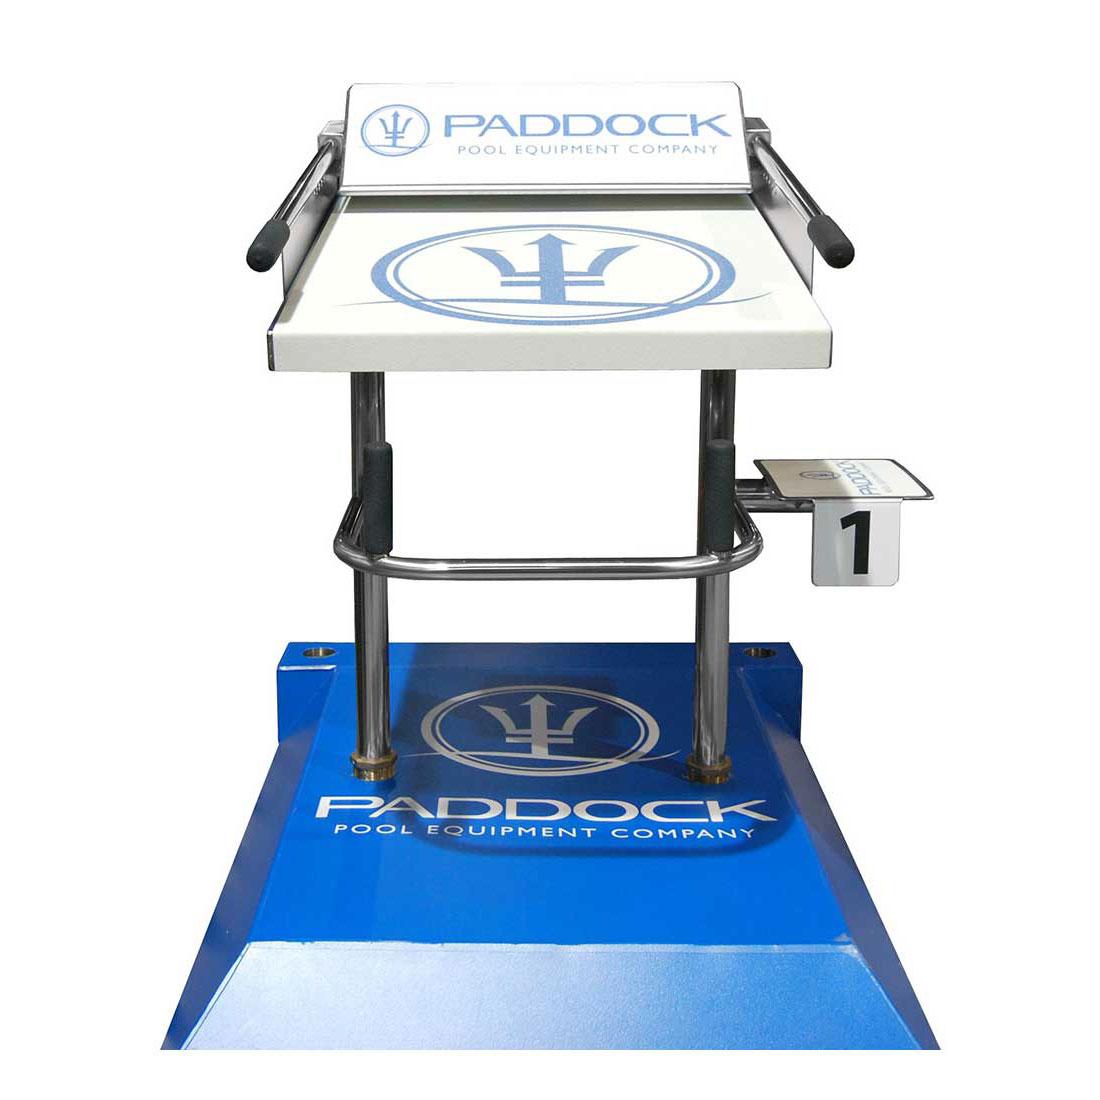 Fast Track 2 Paddock Pool Equipment Company